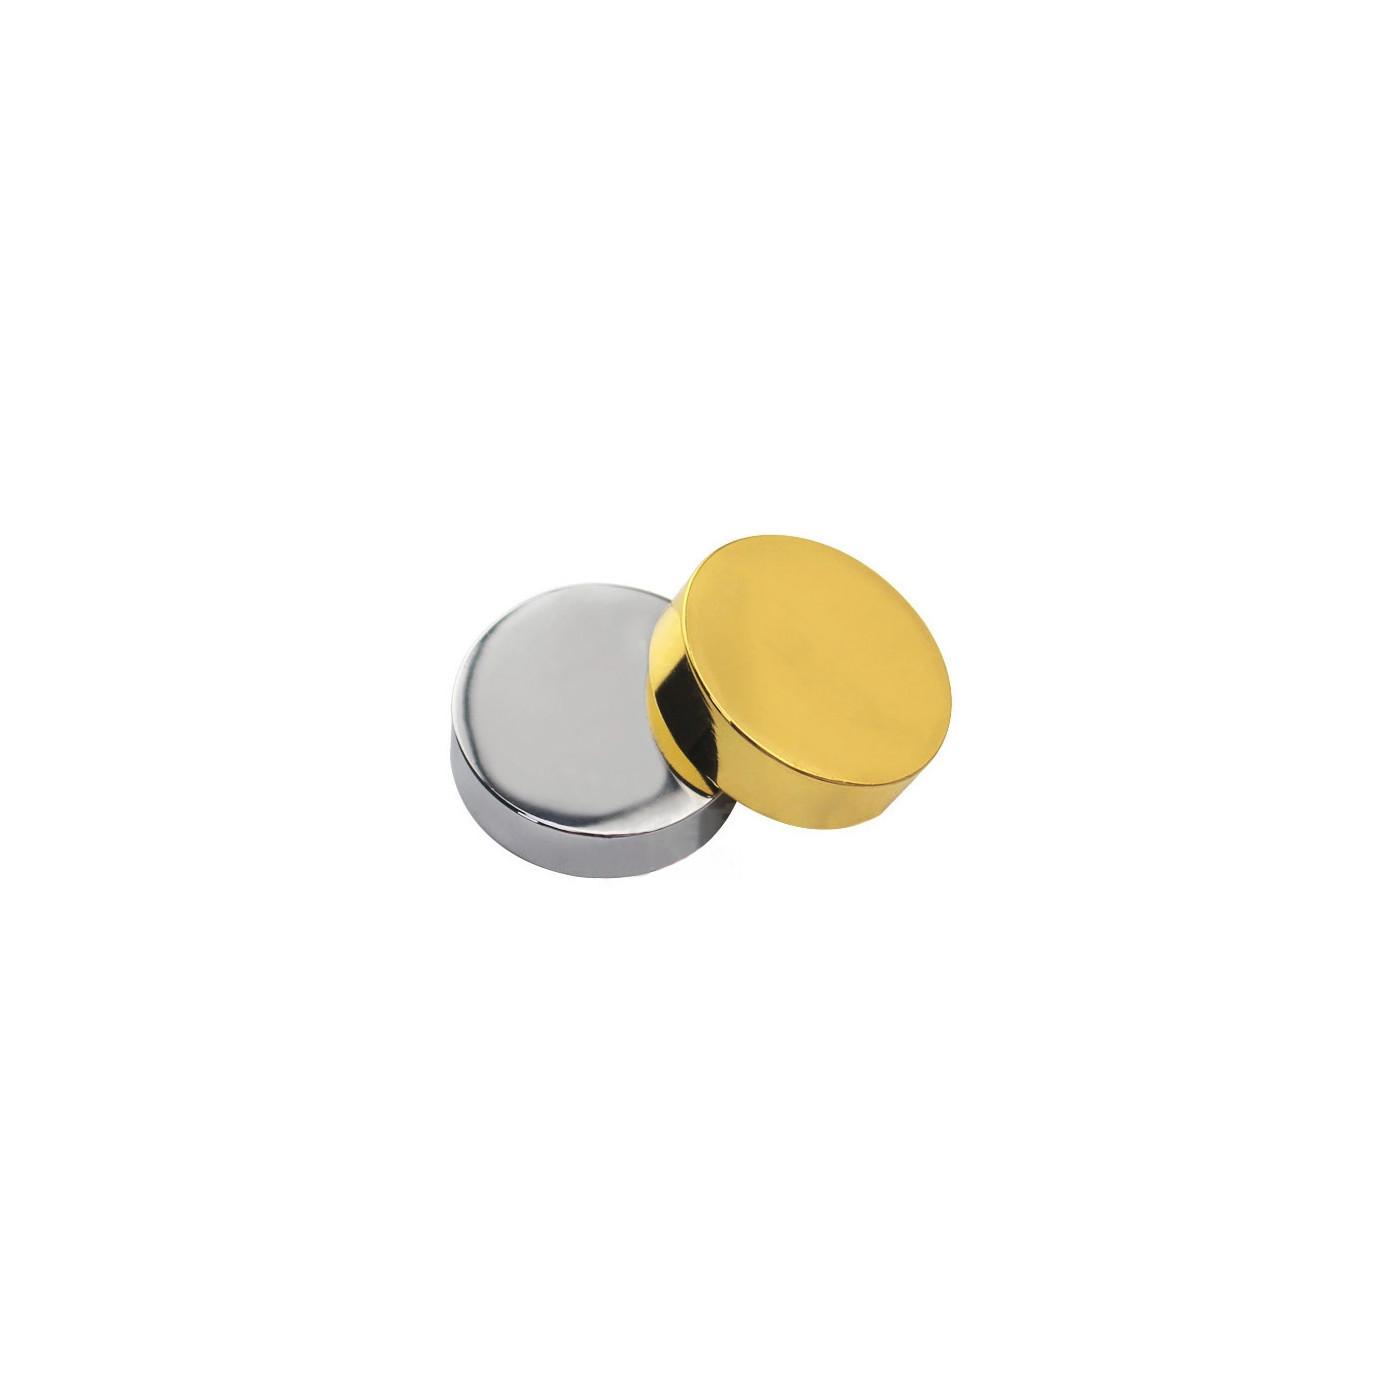 Conjunto de 24 tapas decorativas de metal, oro 11.5x5.0 mm  - 1